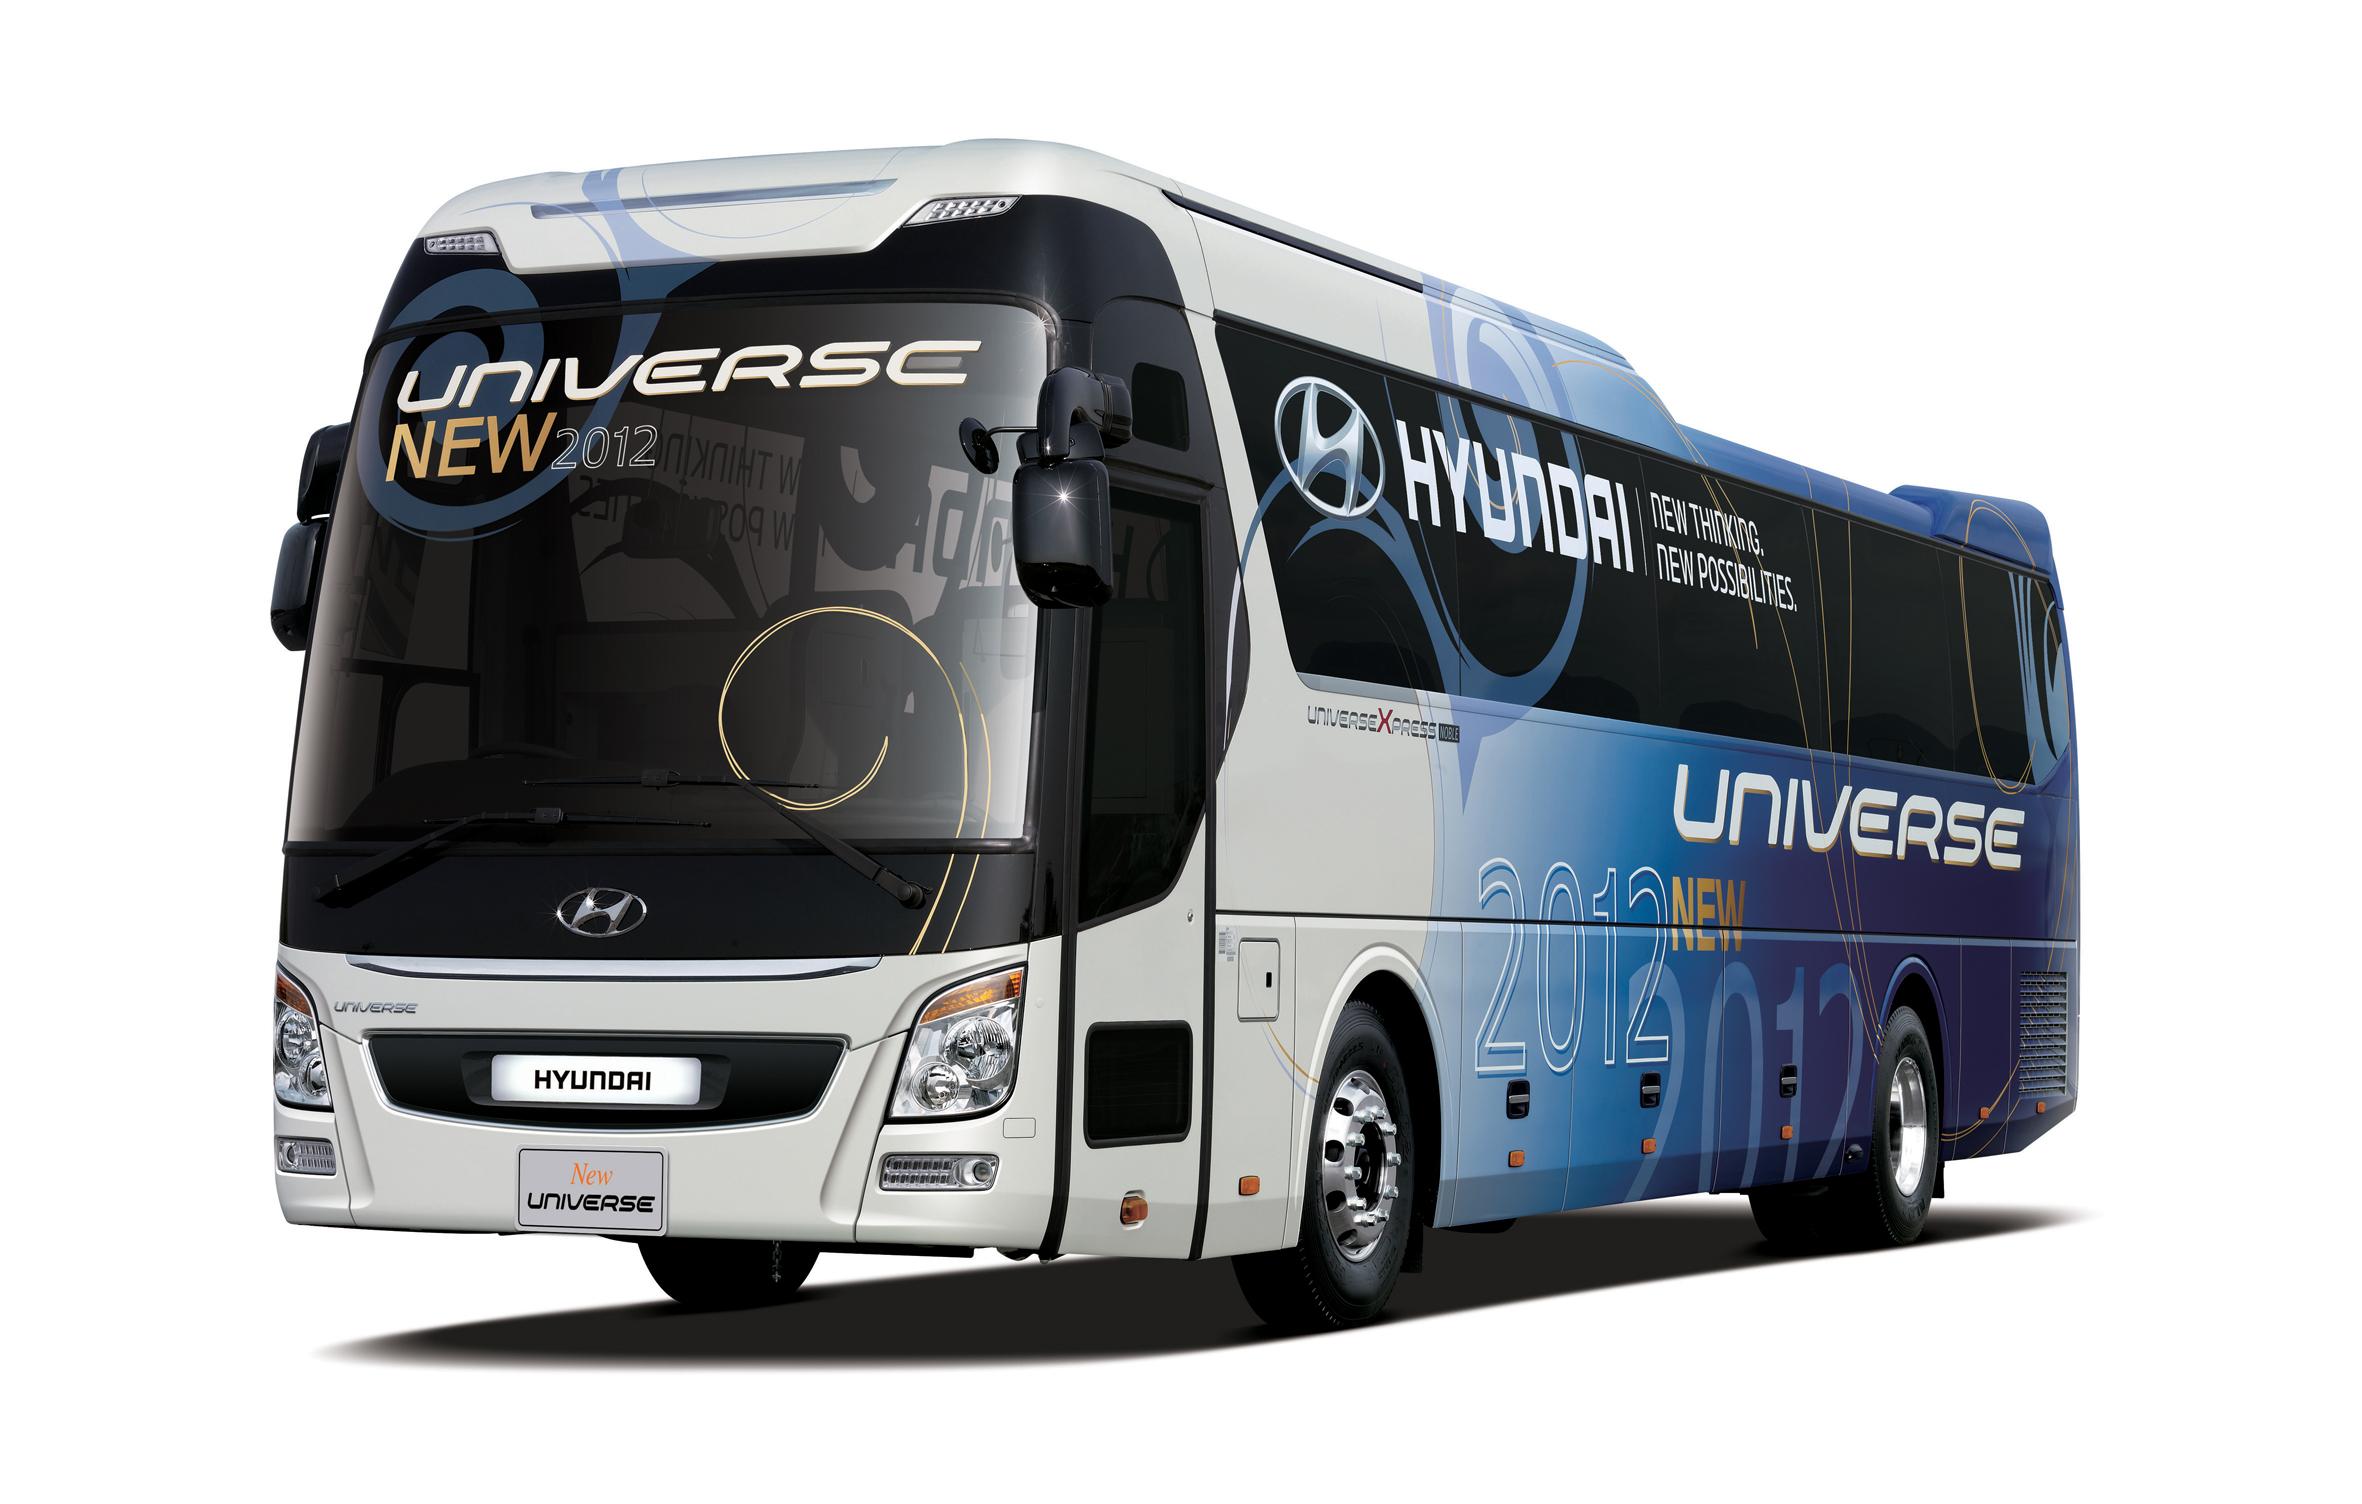 Hyundai universe 6 hyundai motor company